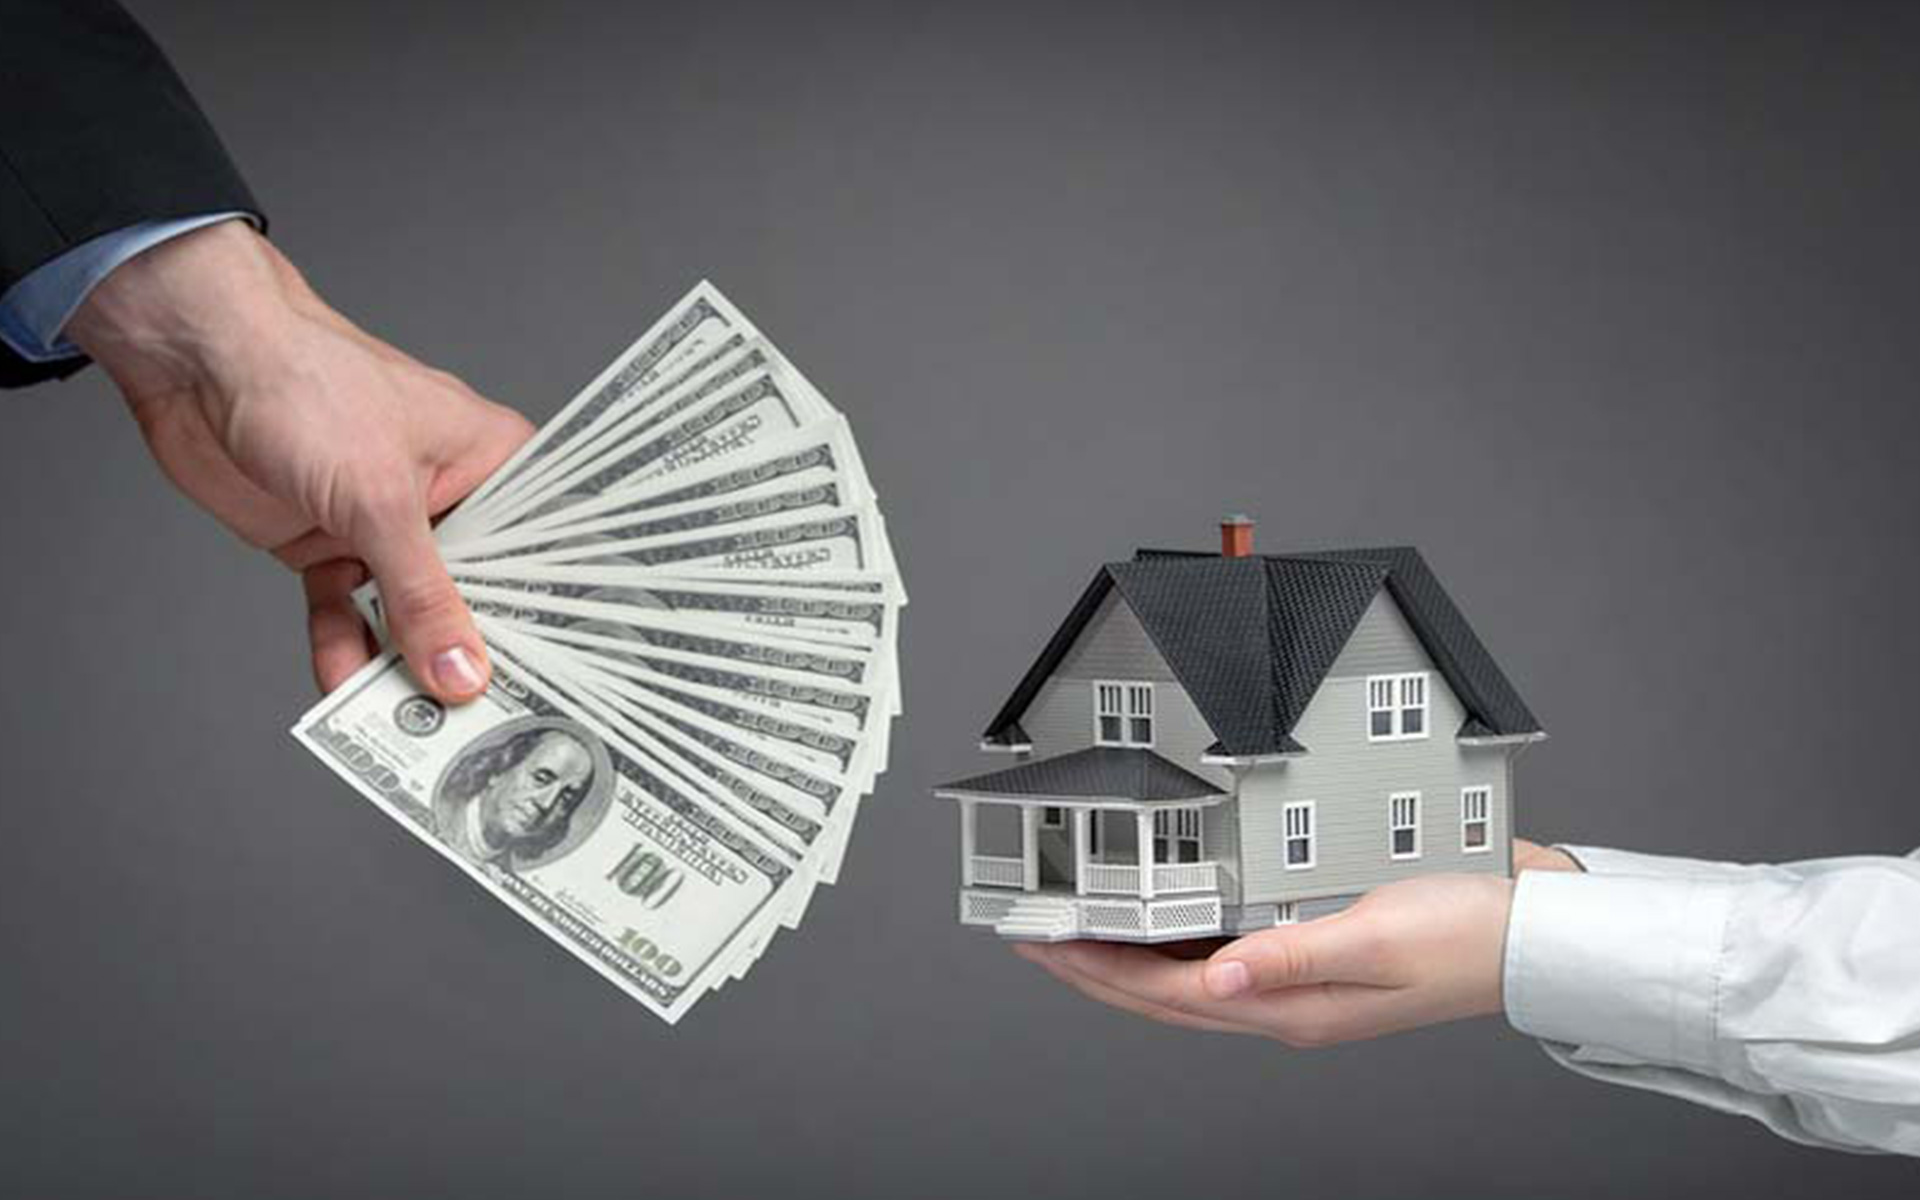 займ под залог недвижимости это ипотека